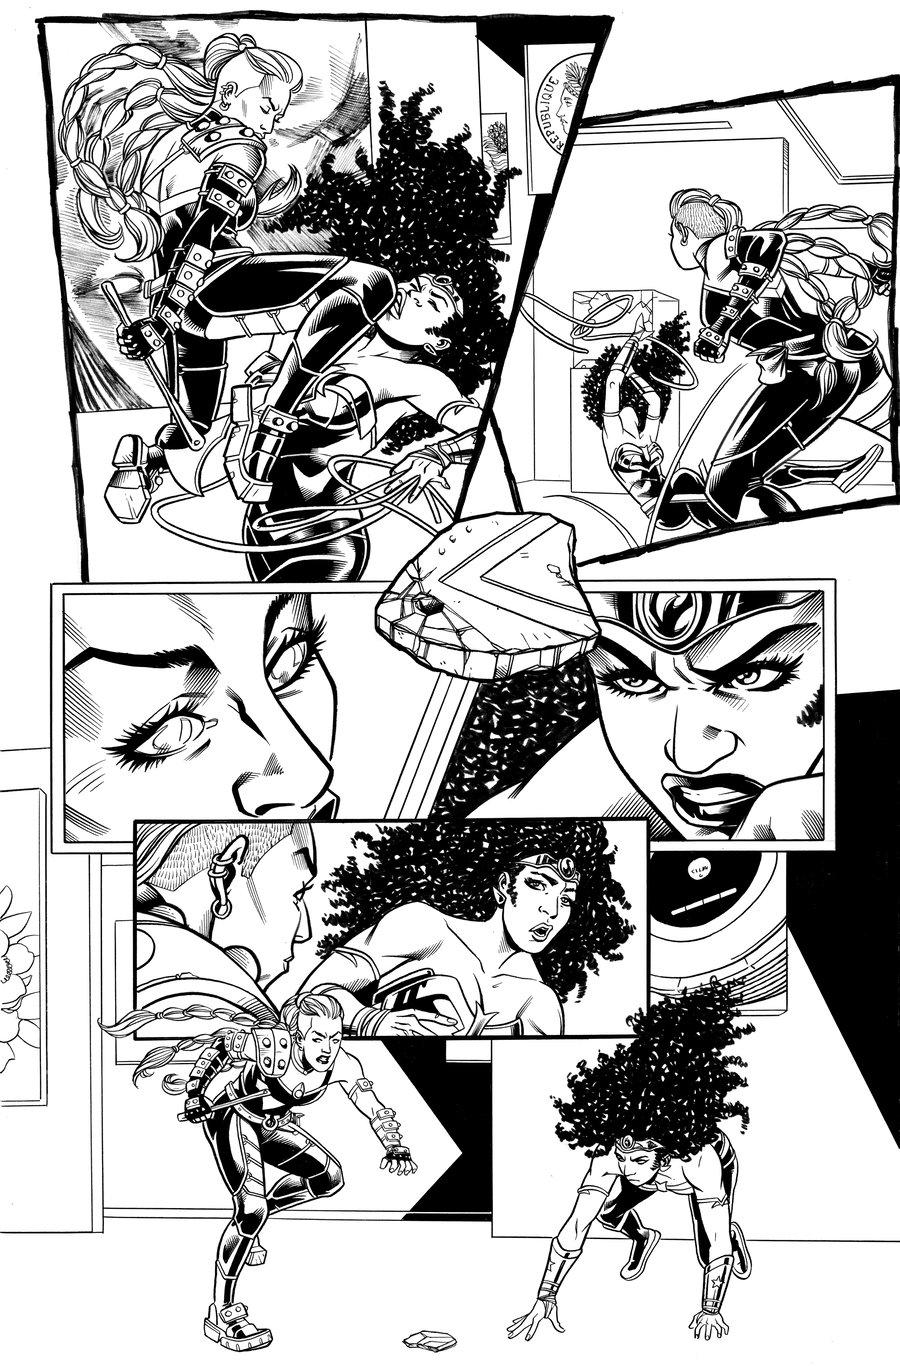 Image of Immortal Wonder Woman: Nubia (2021) #1 PG 7